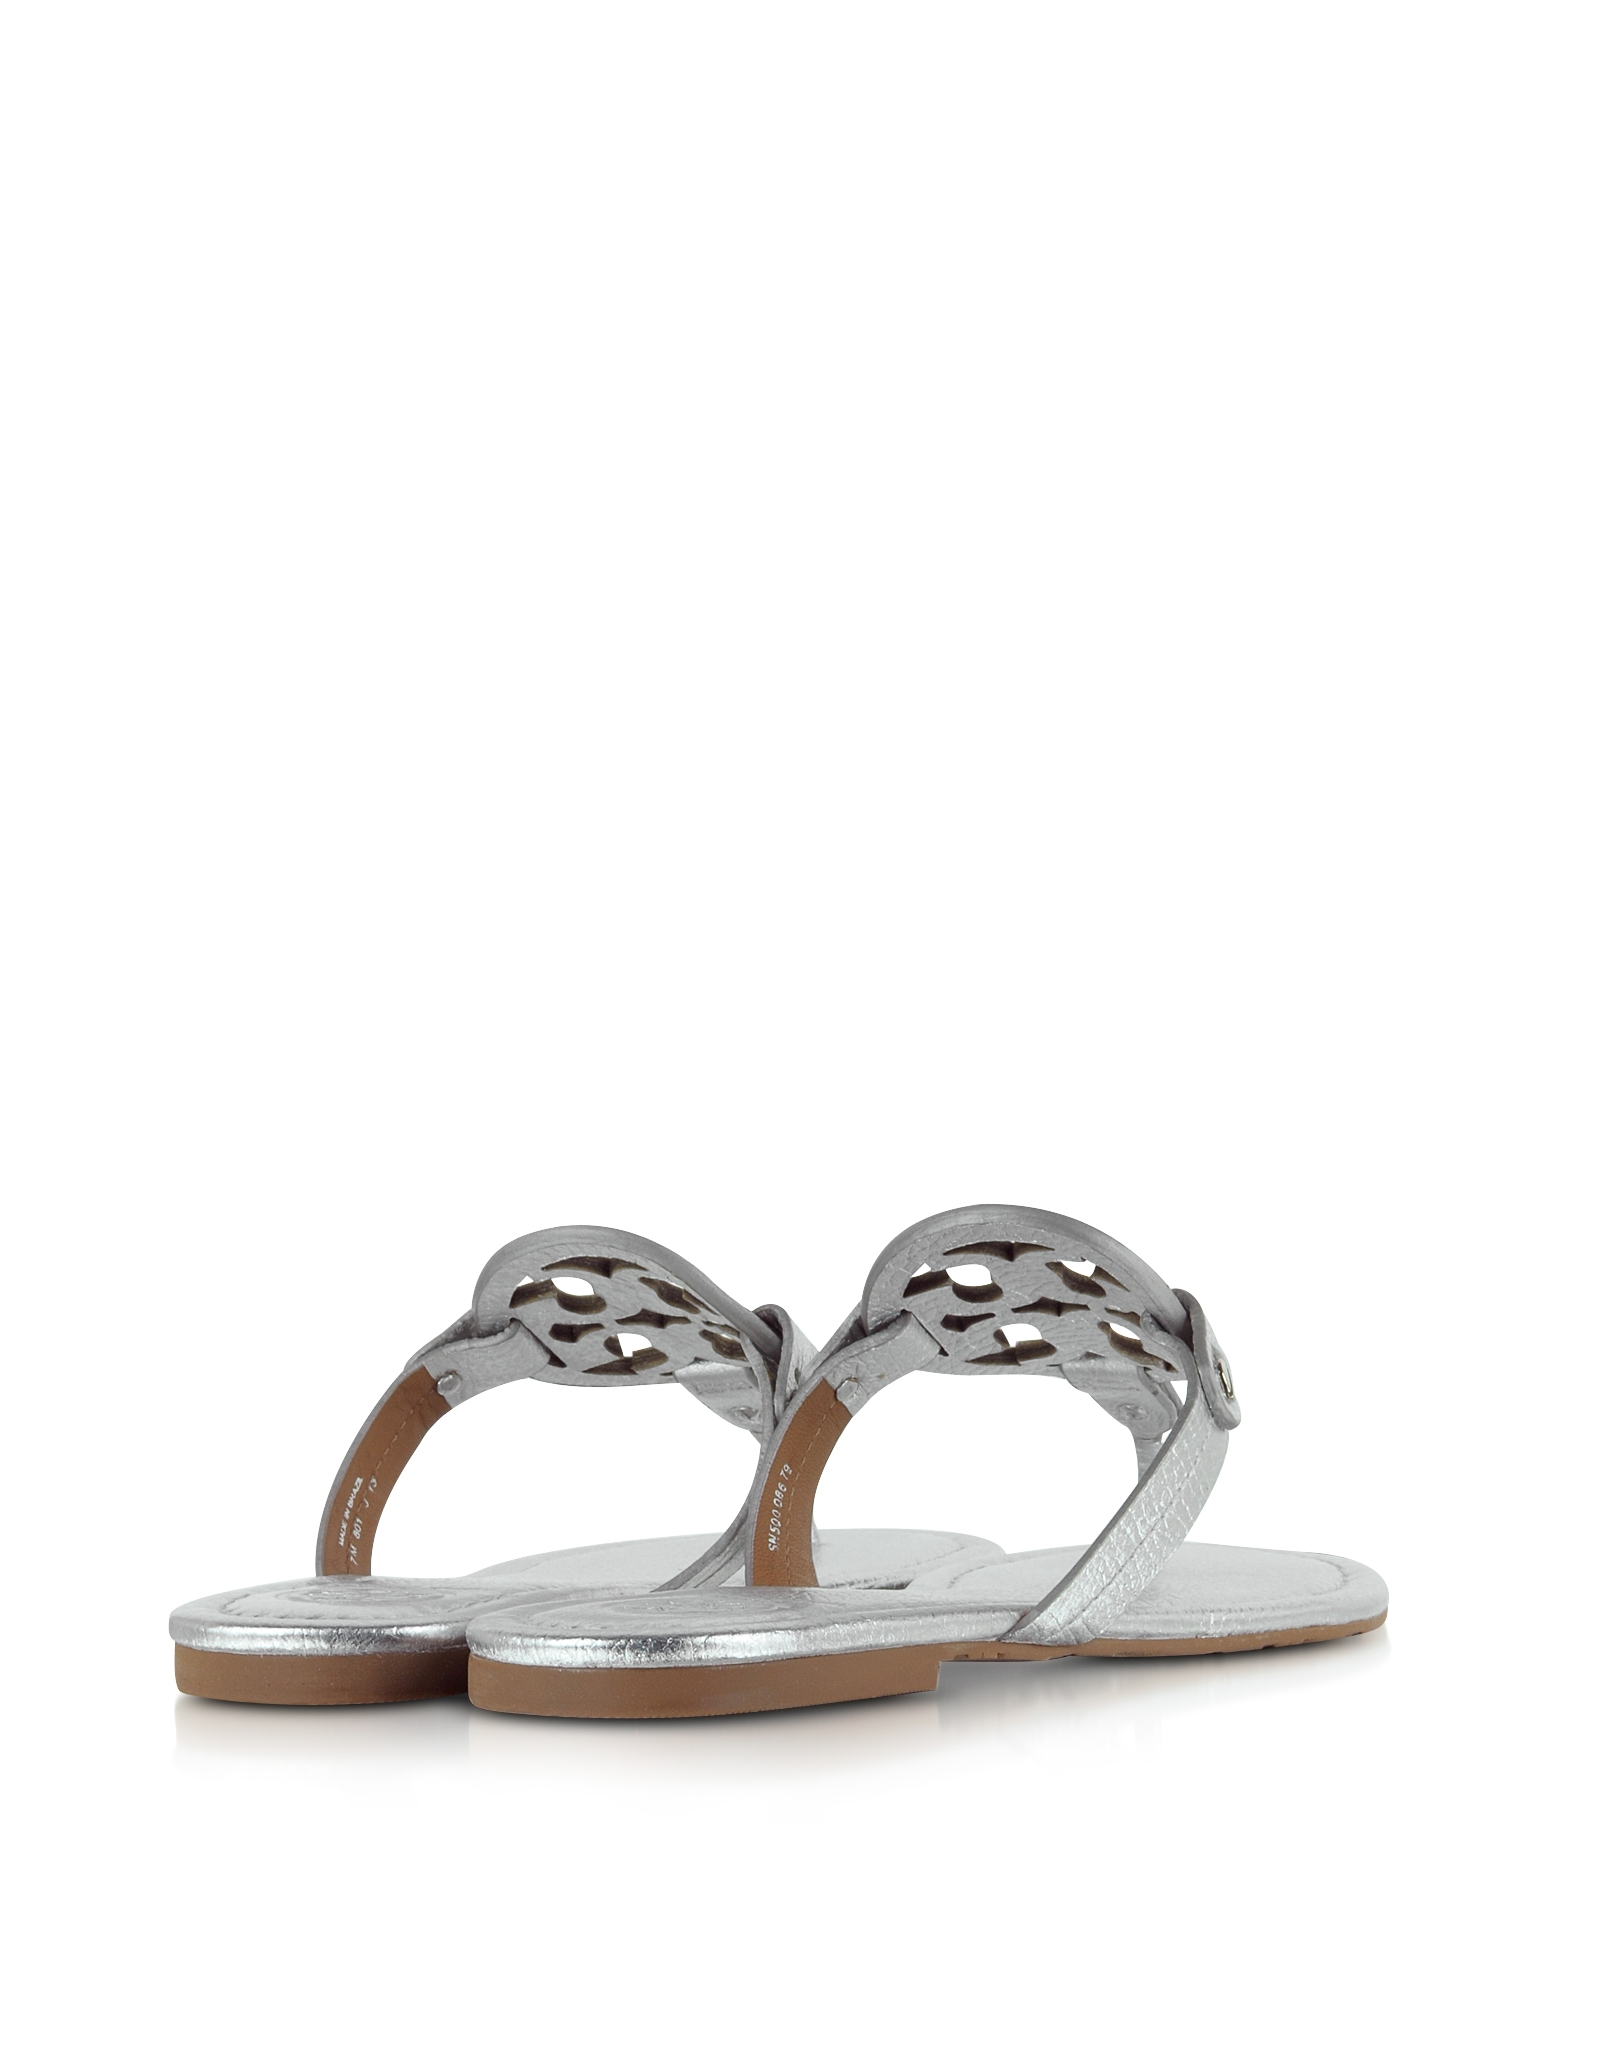 Tory Burch Miller Metallic Silver Leather Sandal In